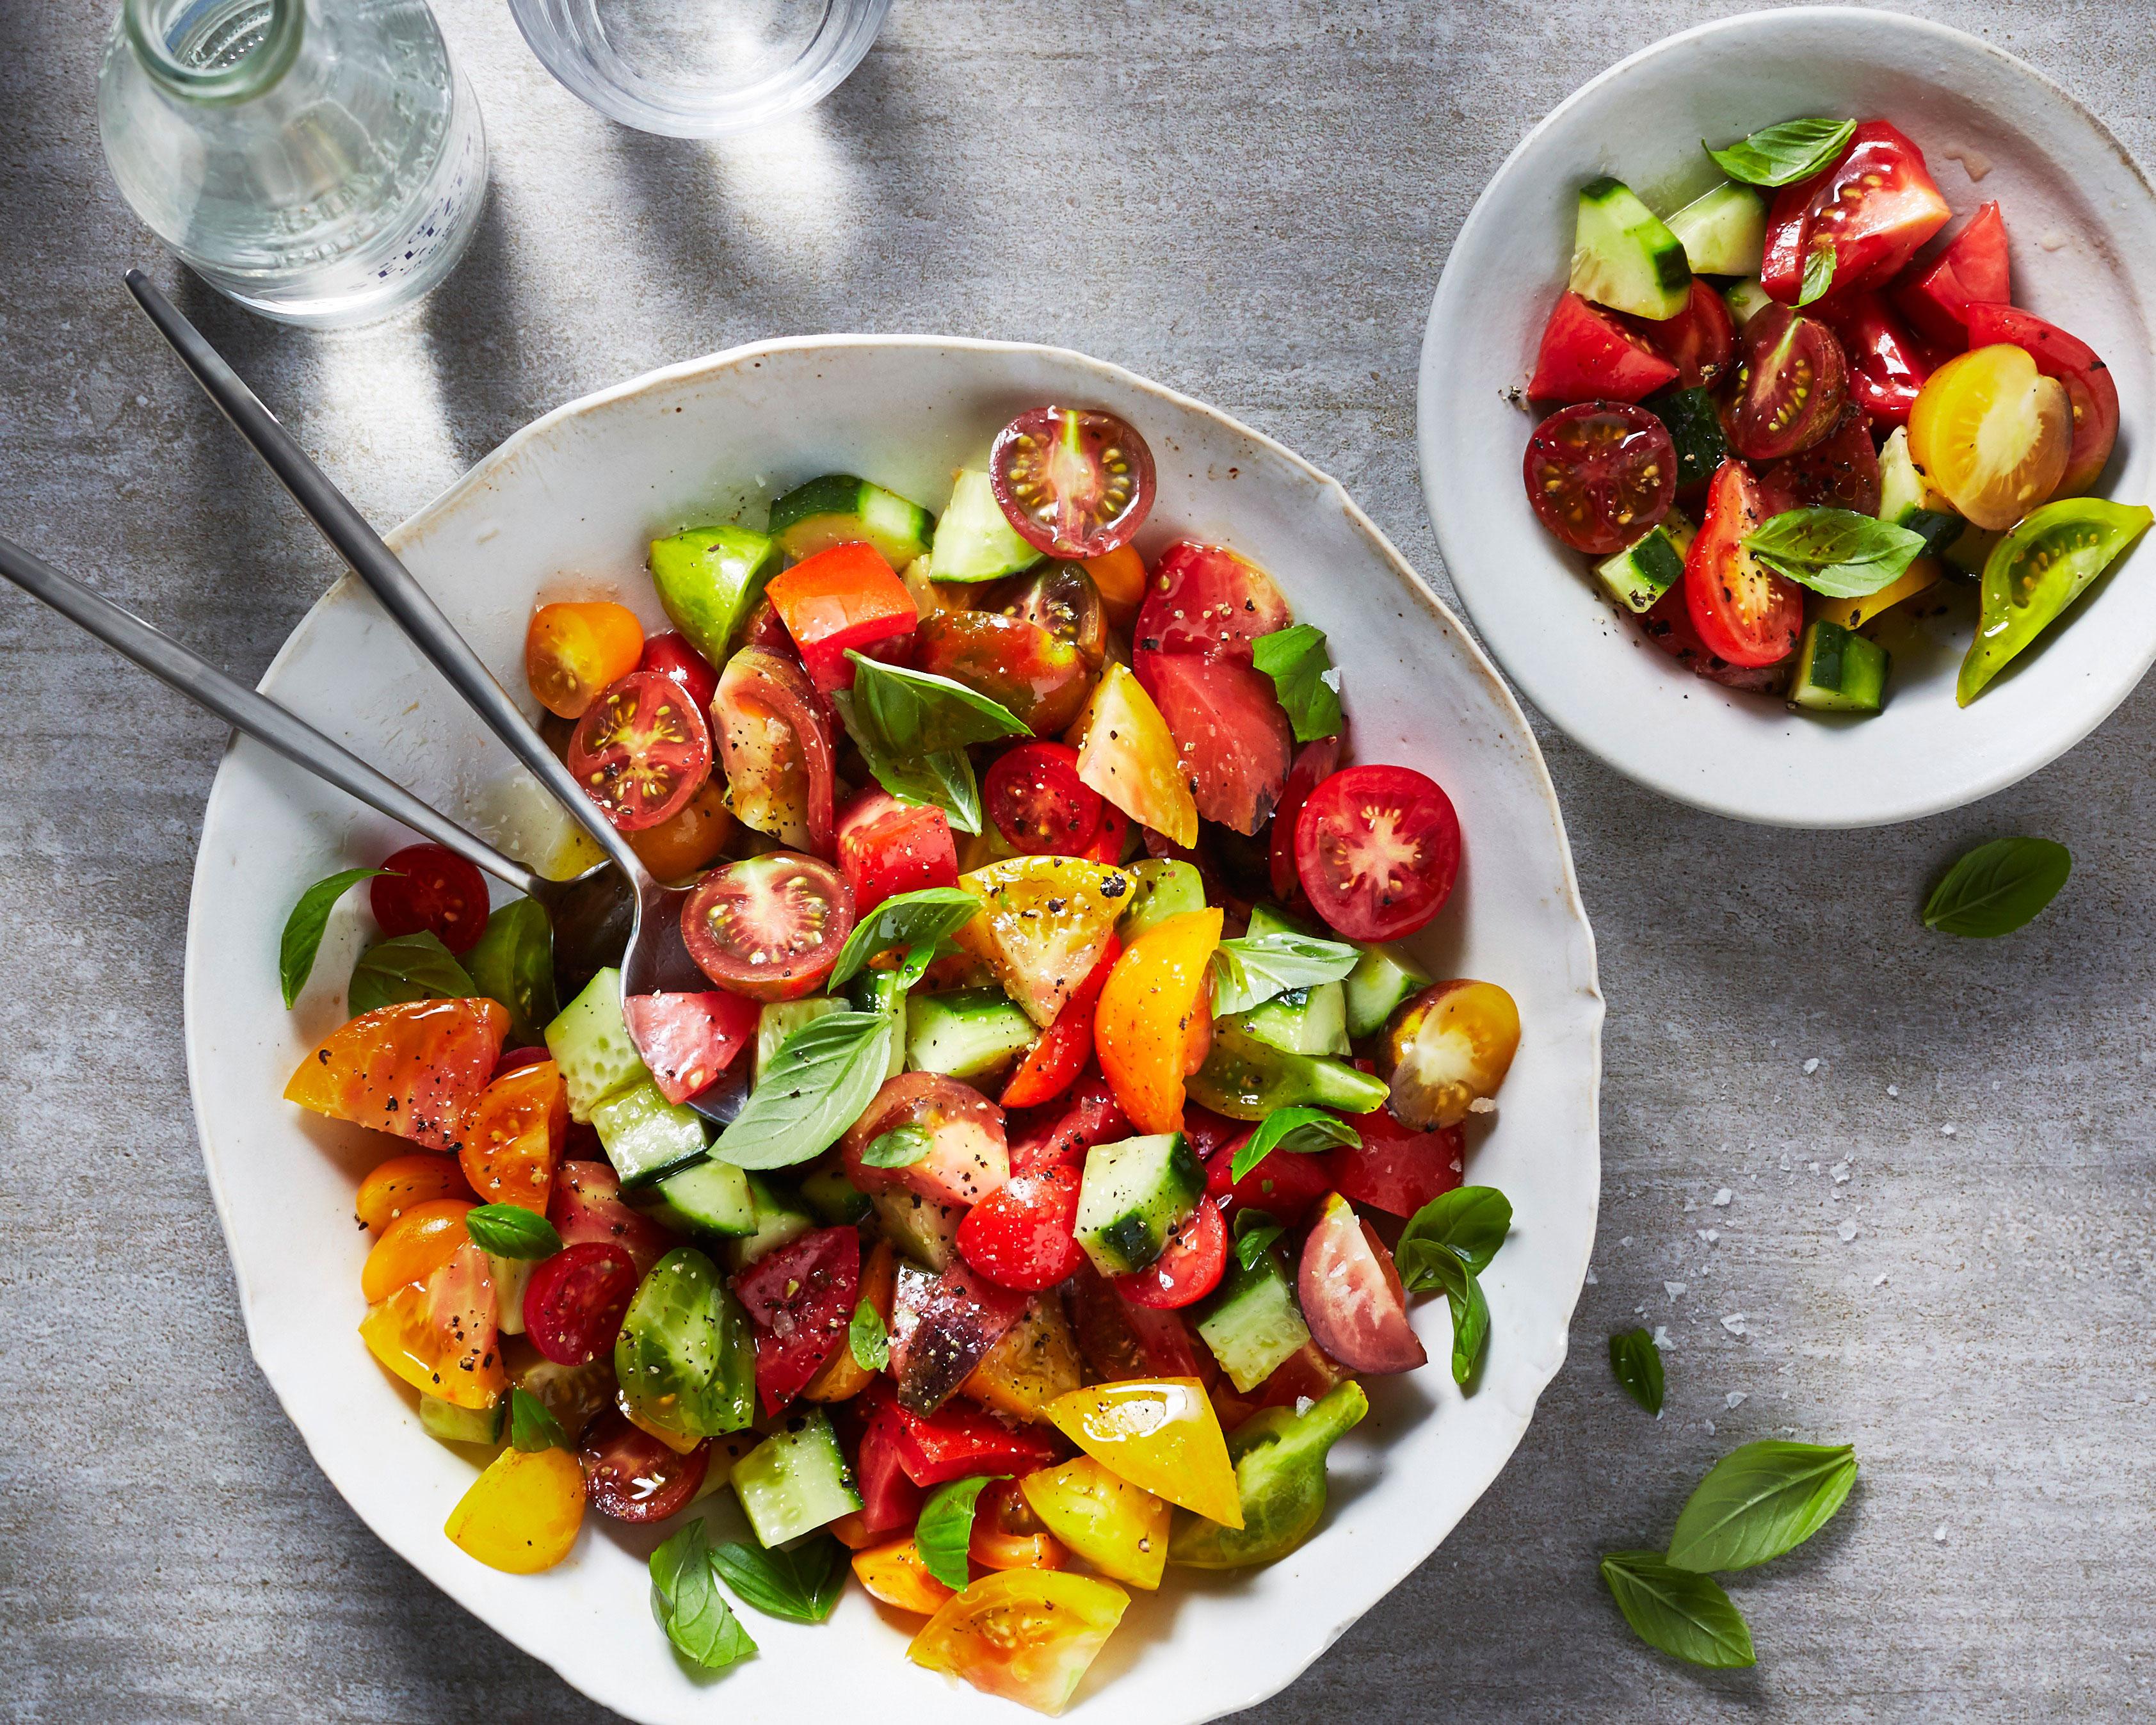 su-Tomato, Cucumber, and Basil Salad